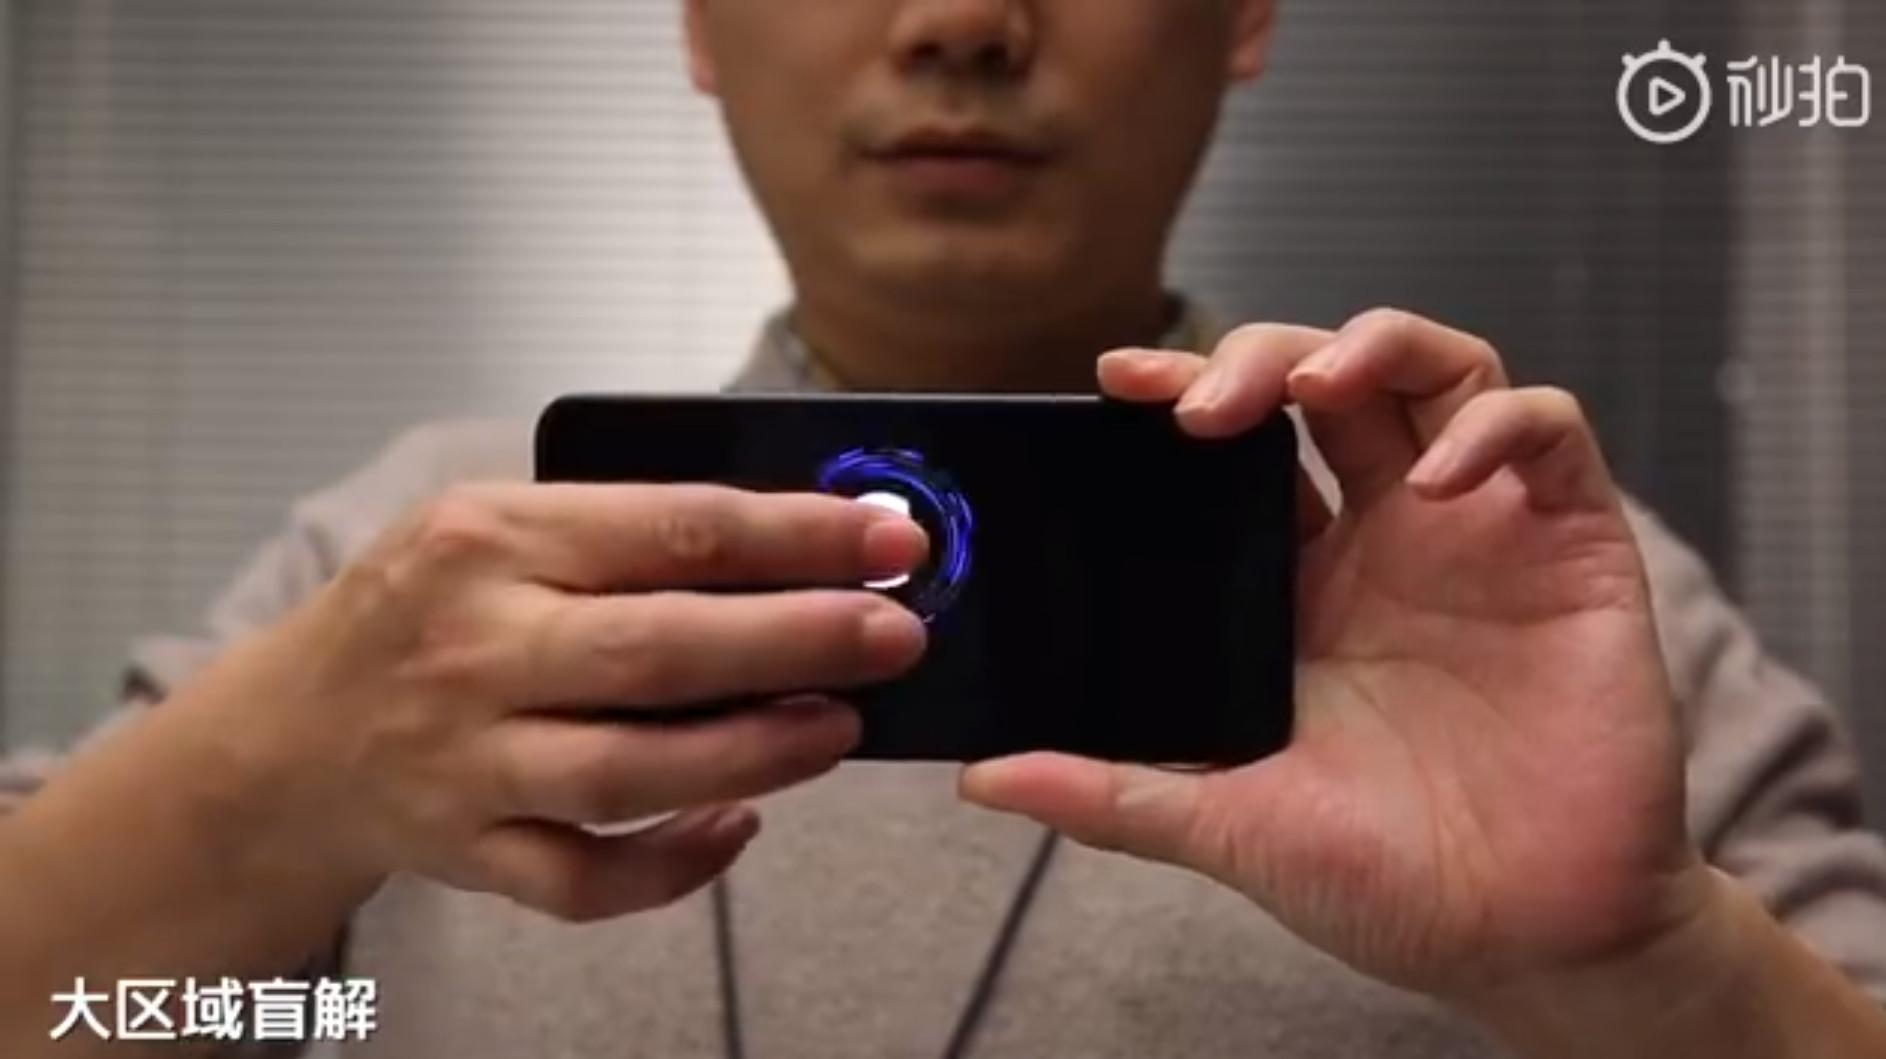 Xiaomi's new in-display fingerprint sensor solves one big issue